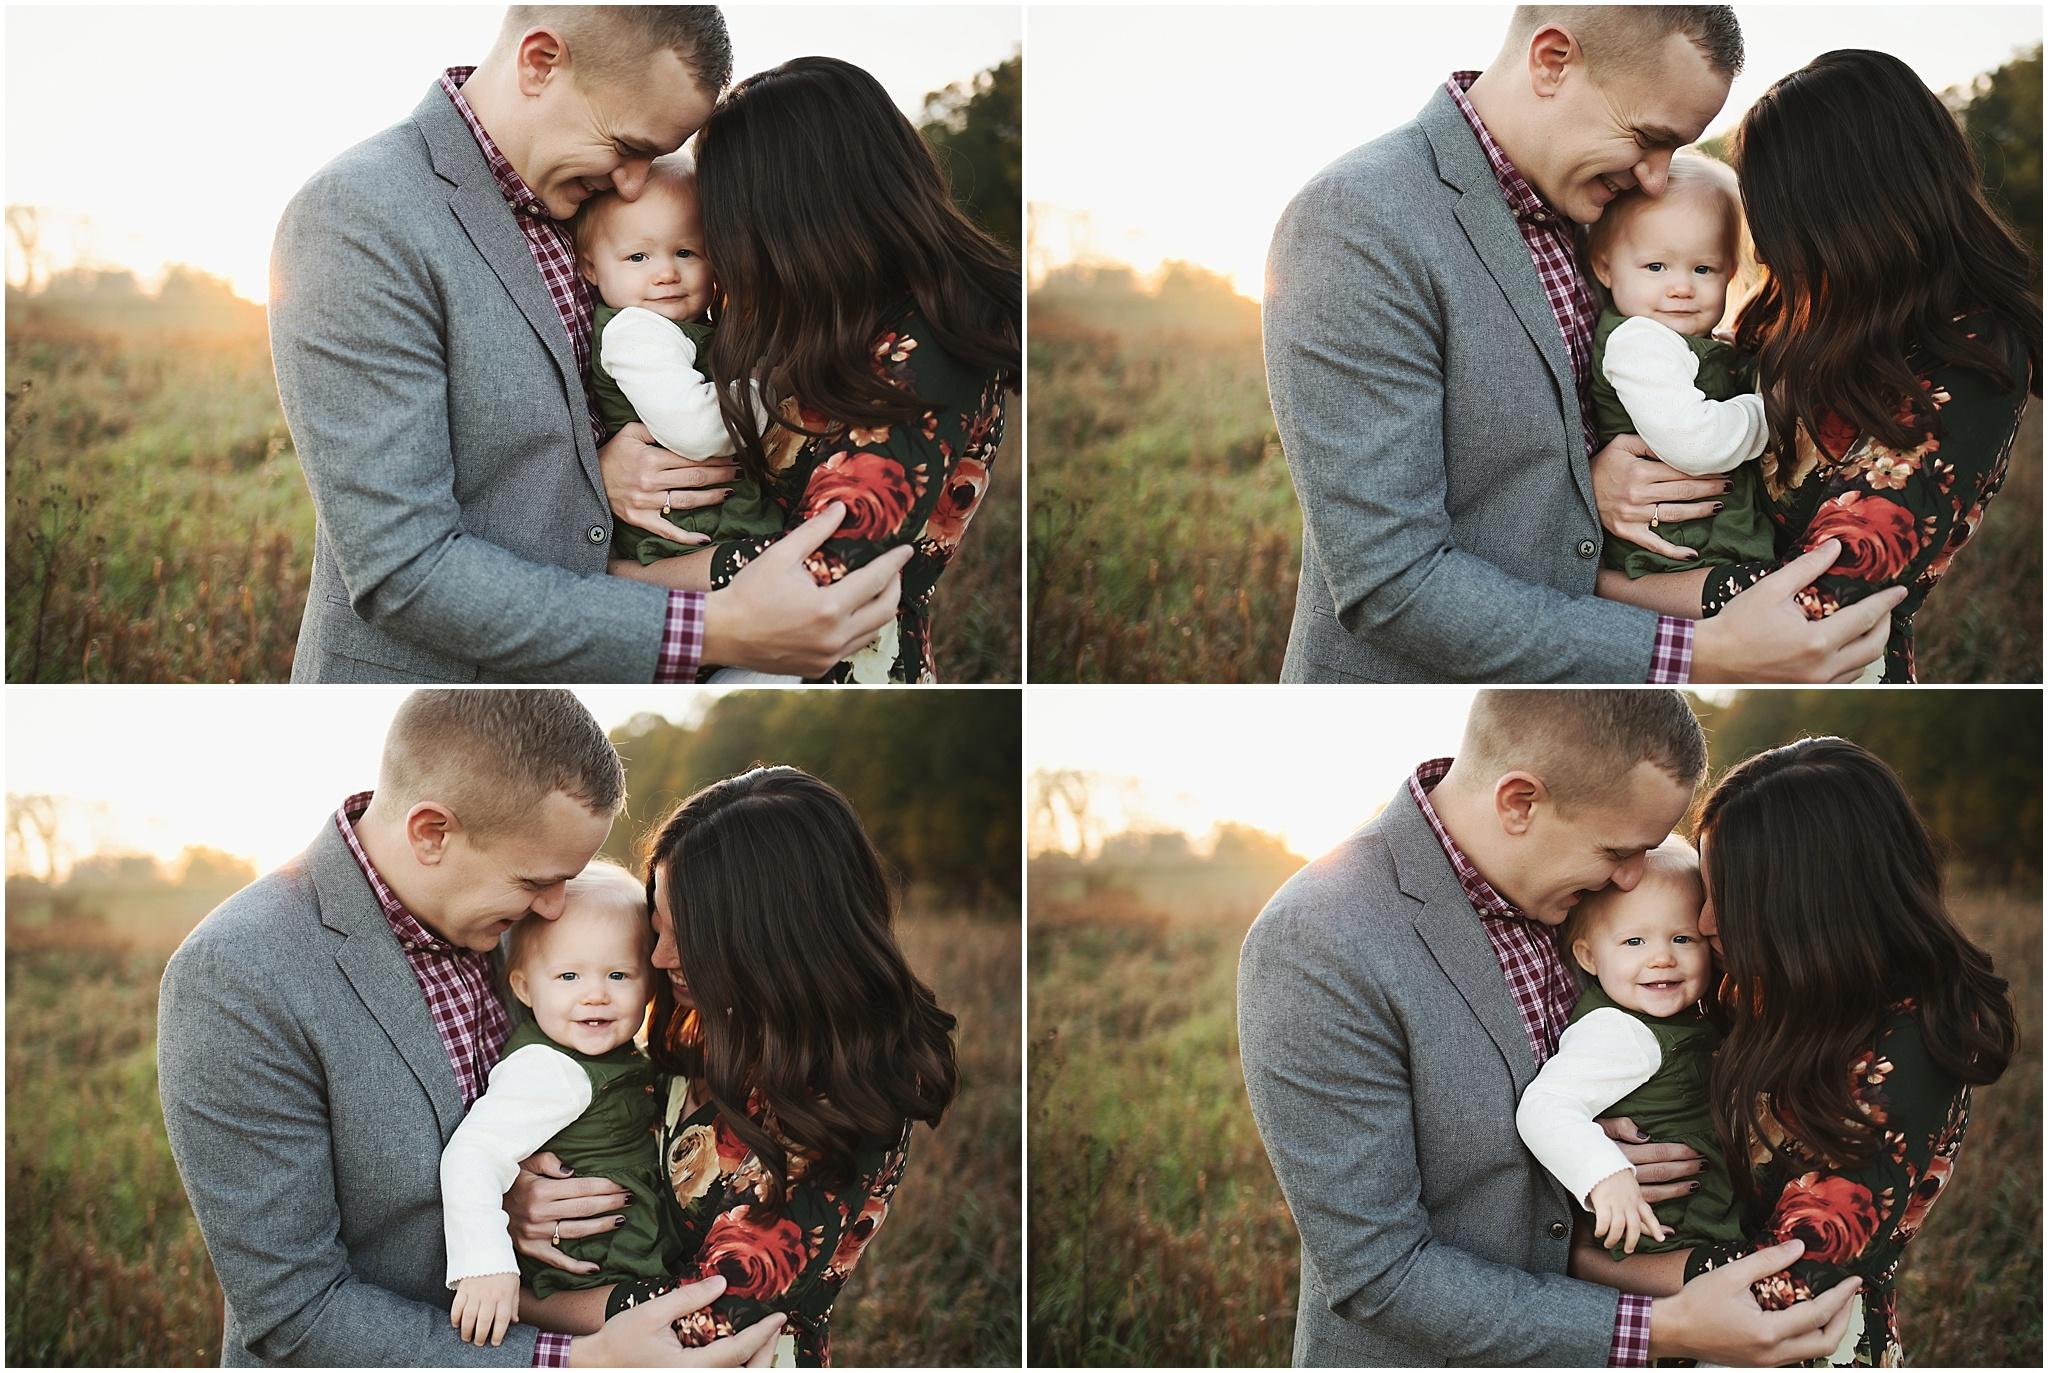 karra lynn photography - family photographer metro detroit